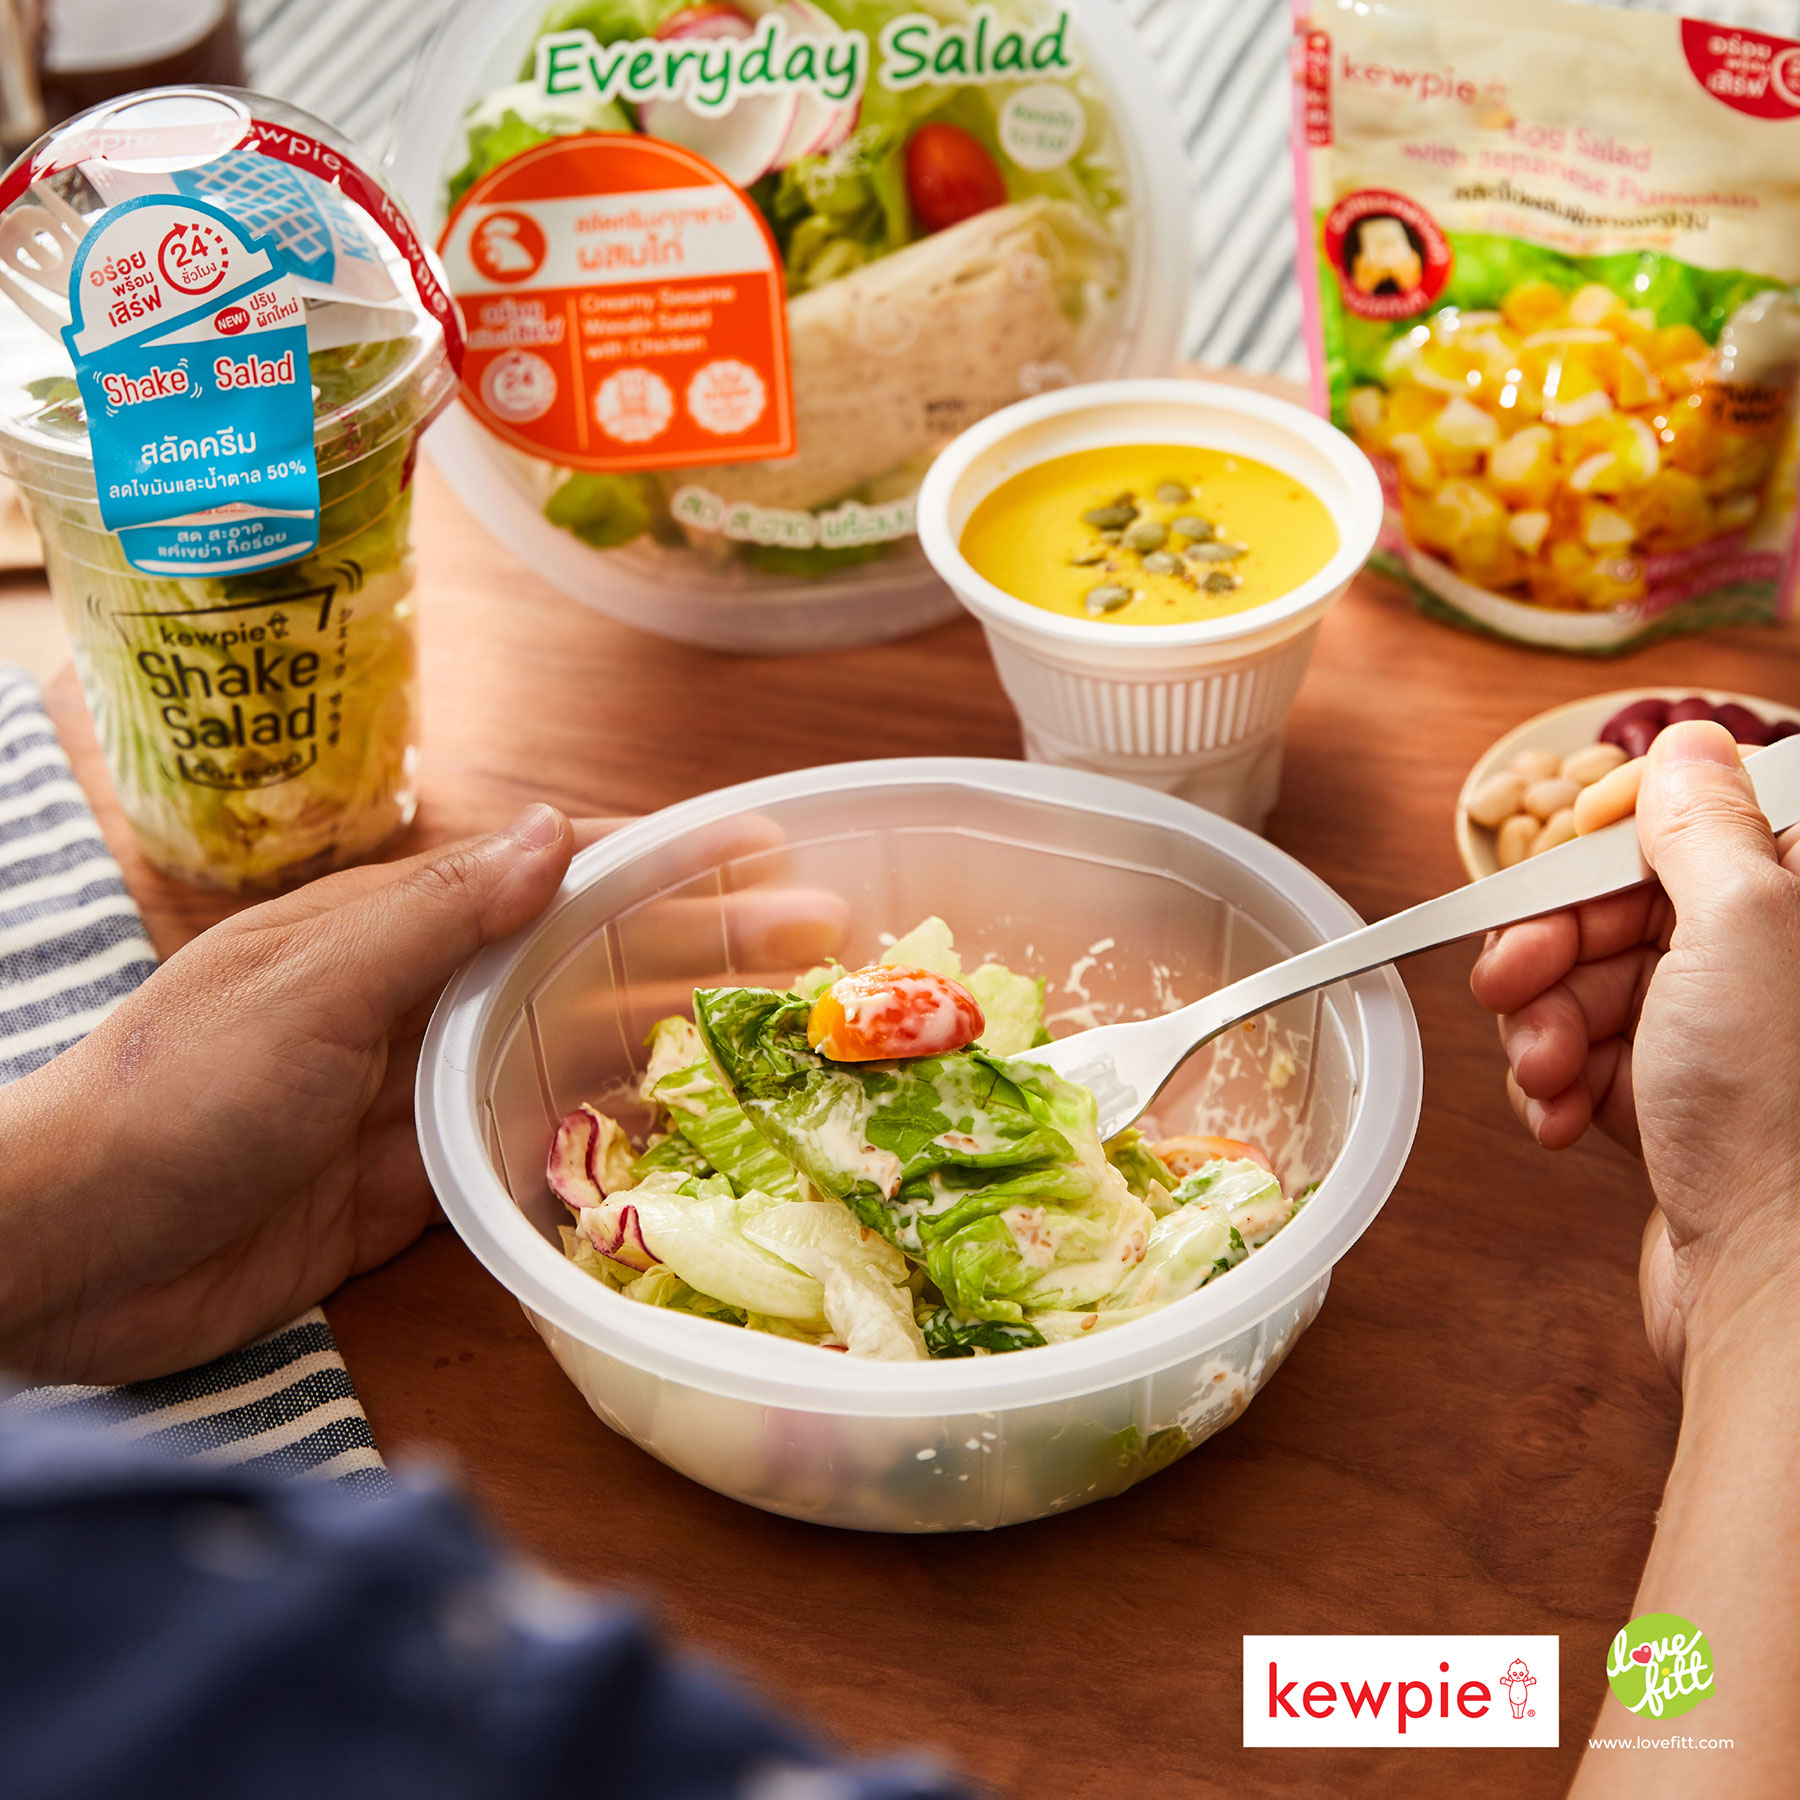 Kewpie คิวพี Everyday Salad น้ำสลัดรสซีซาร์ผสมทูน่า